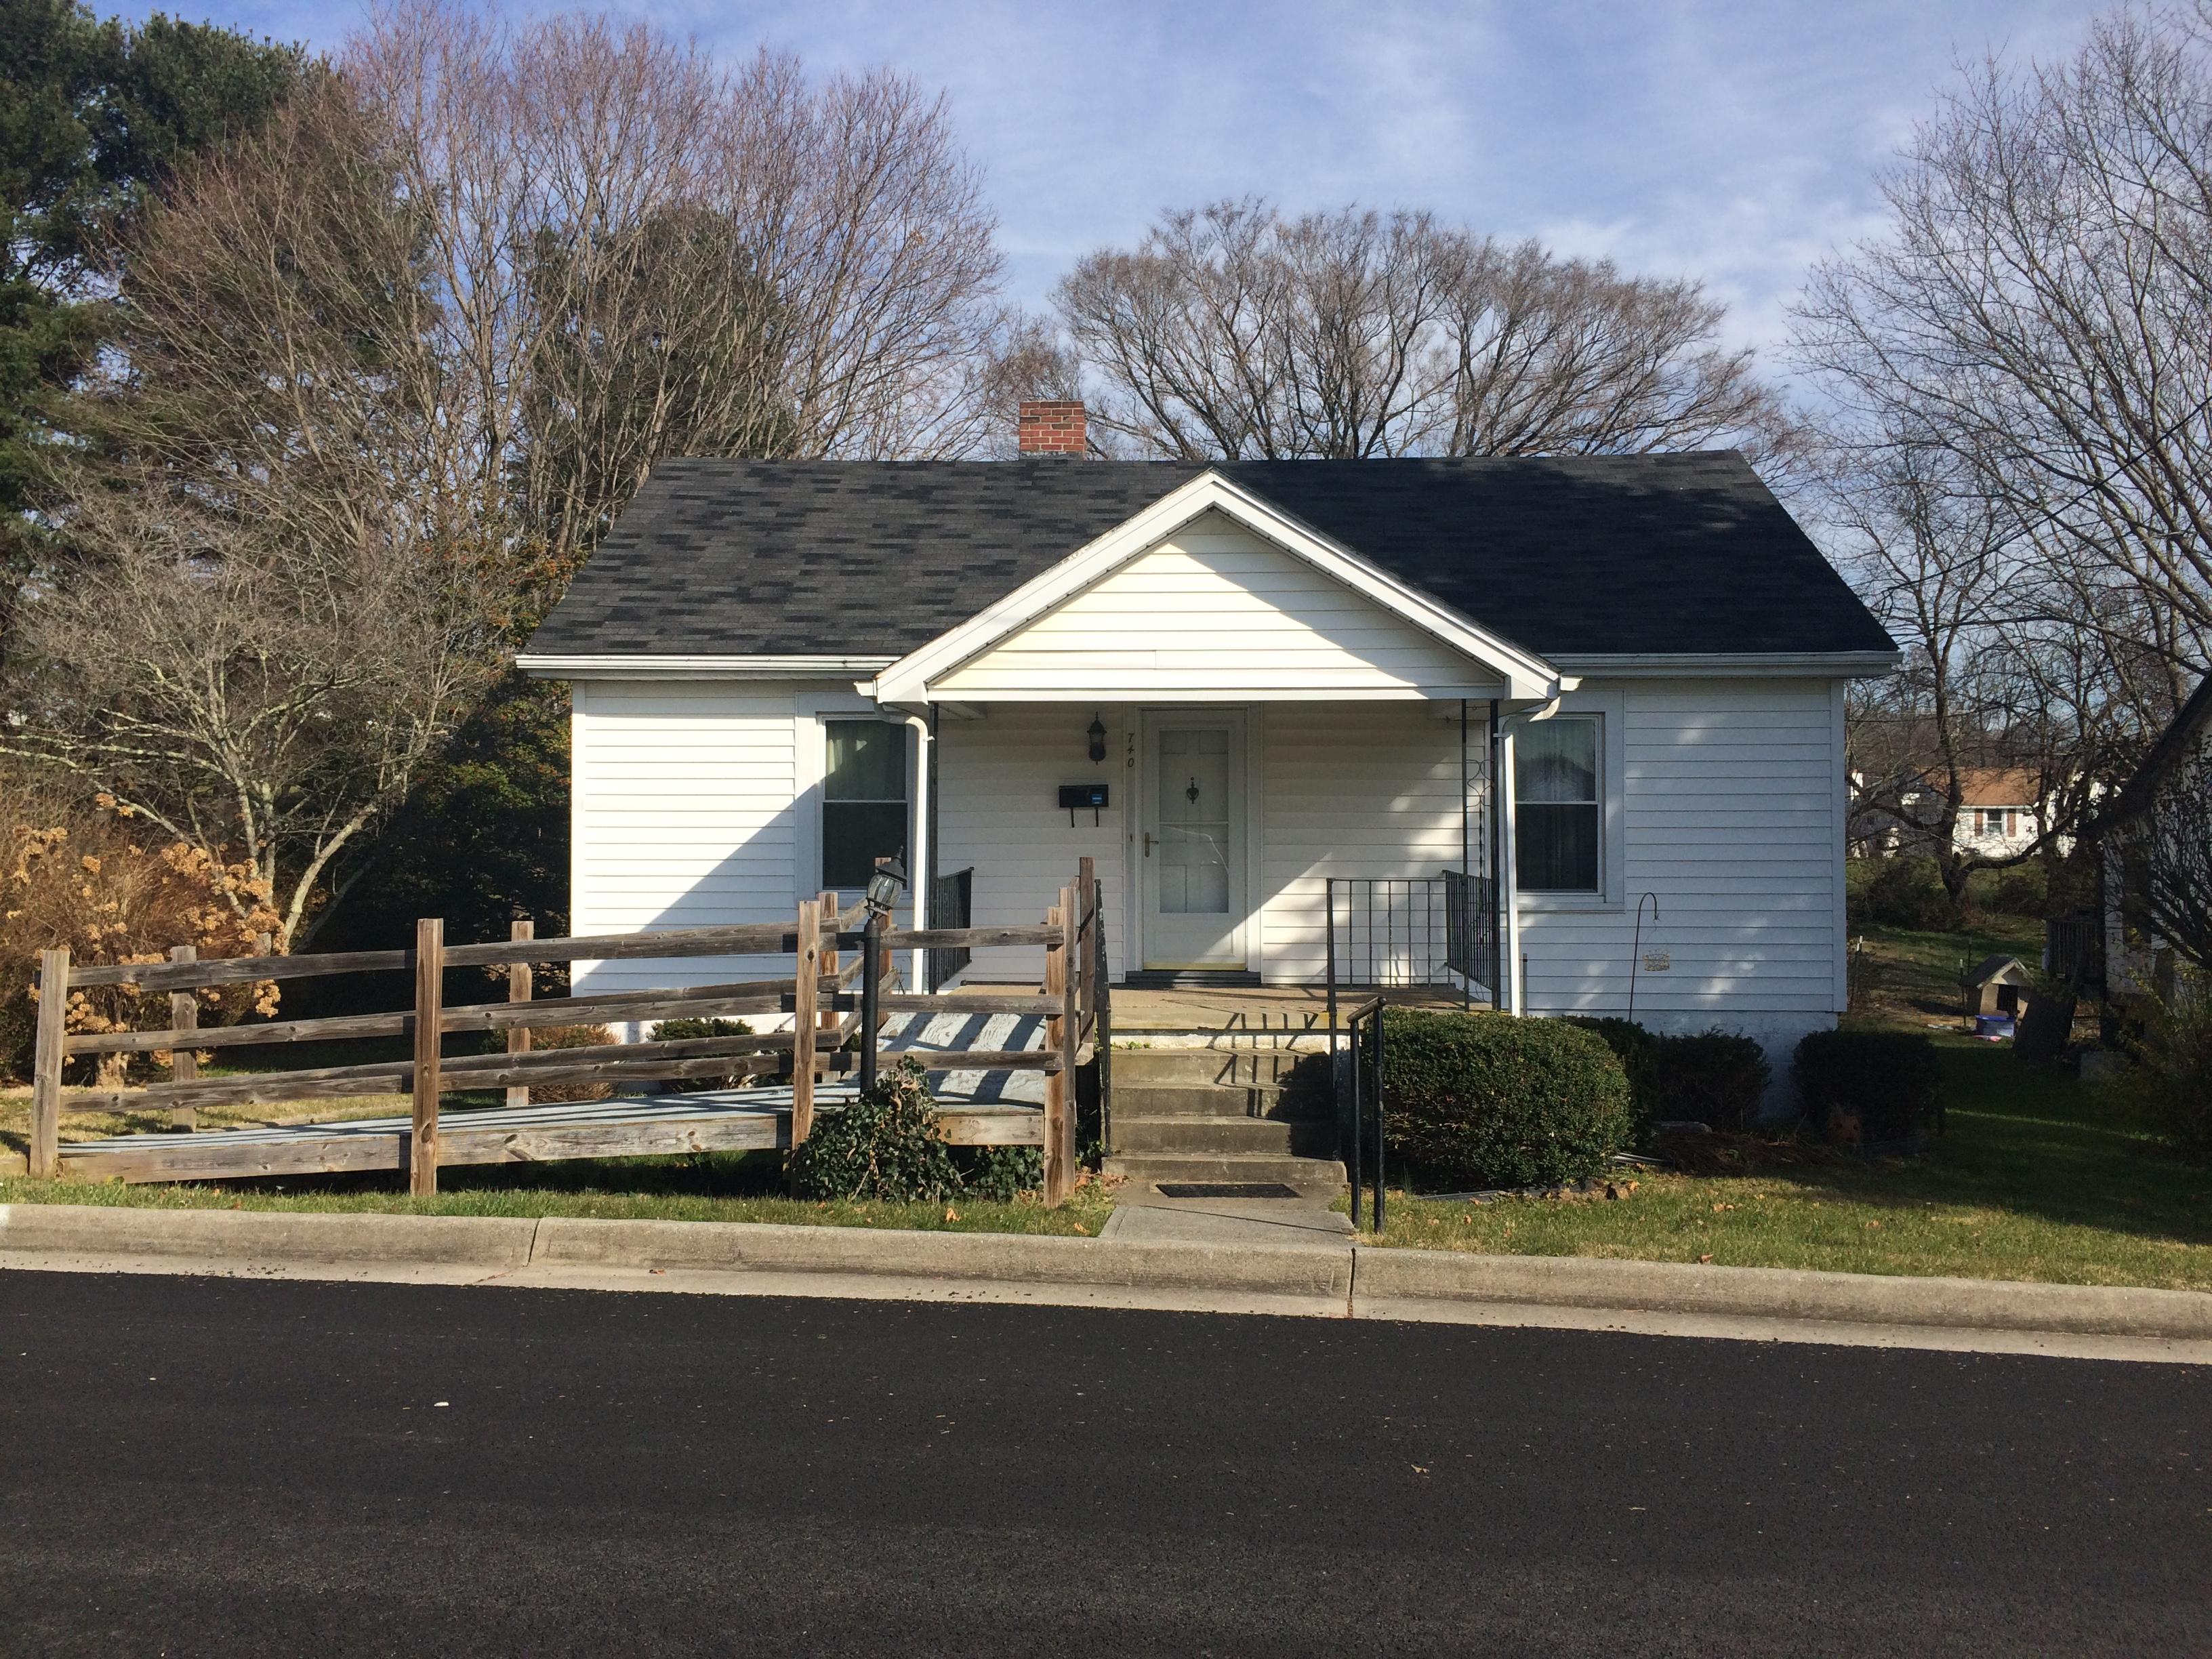 740 N 5th Street, Wytheville, Virginia 24382